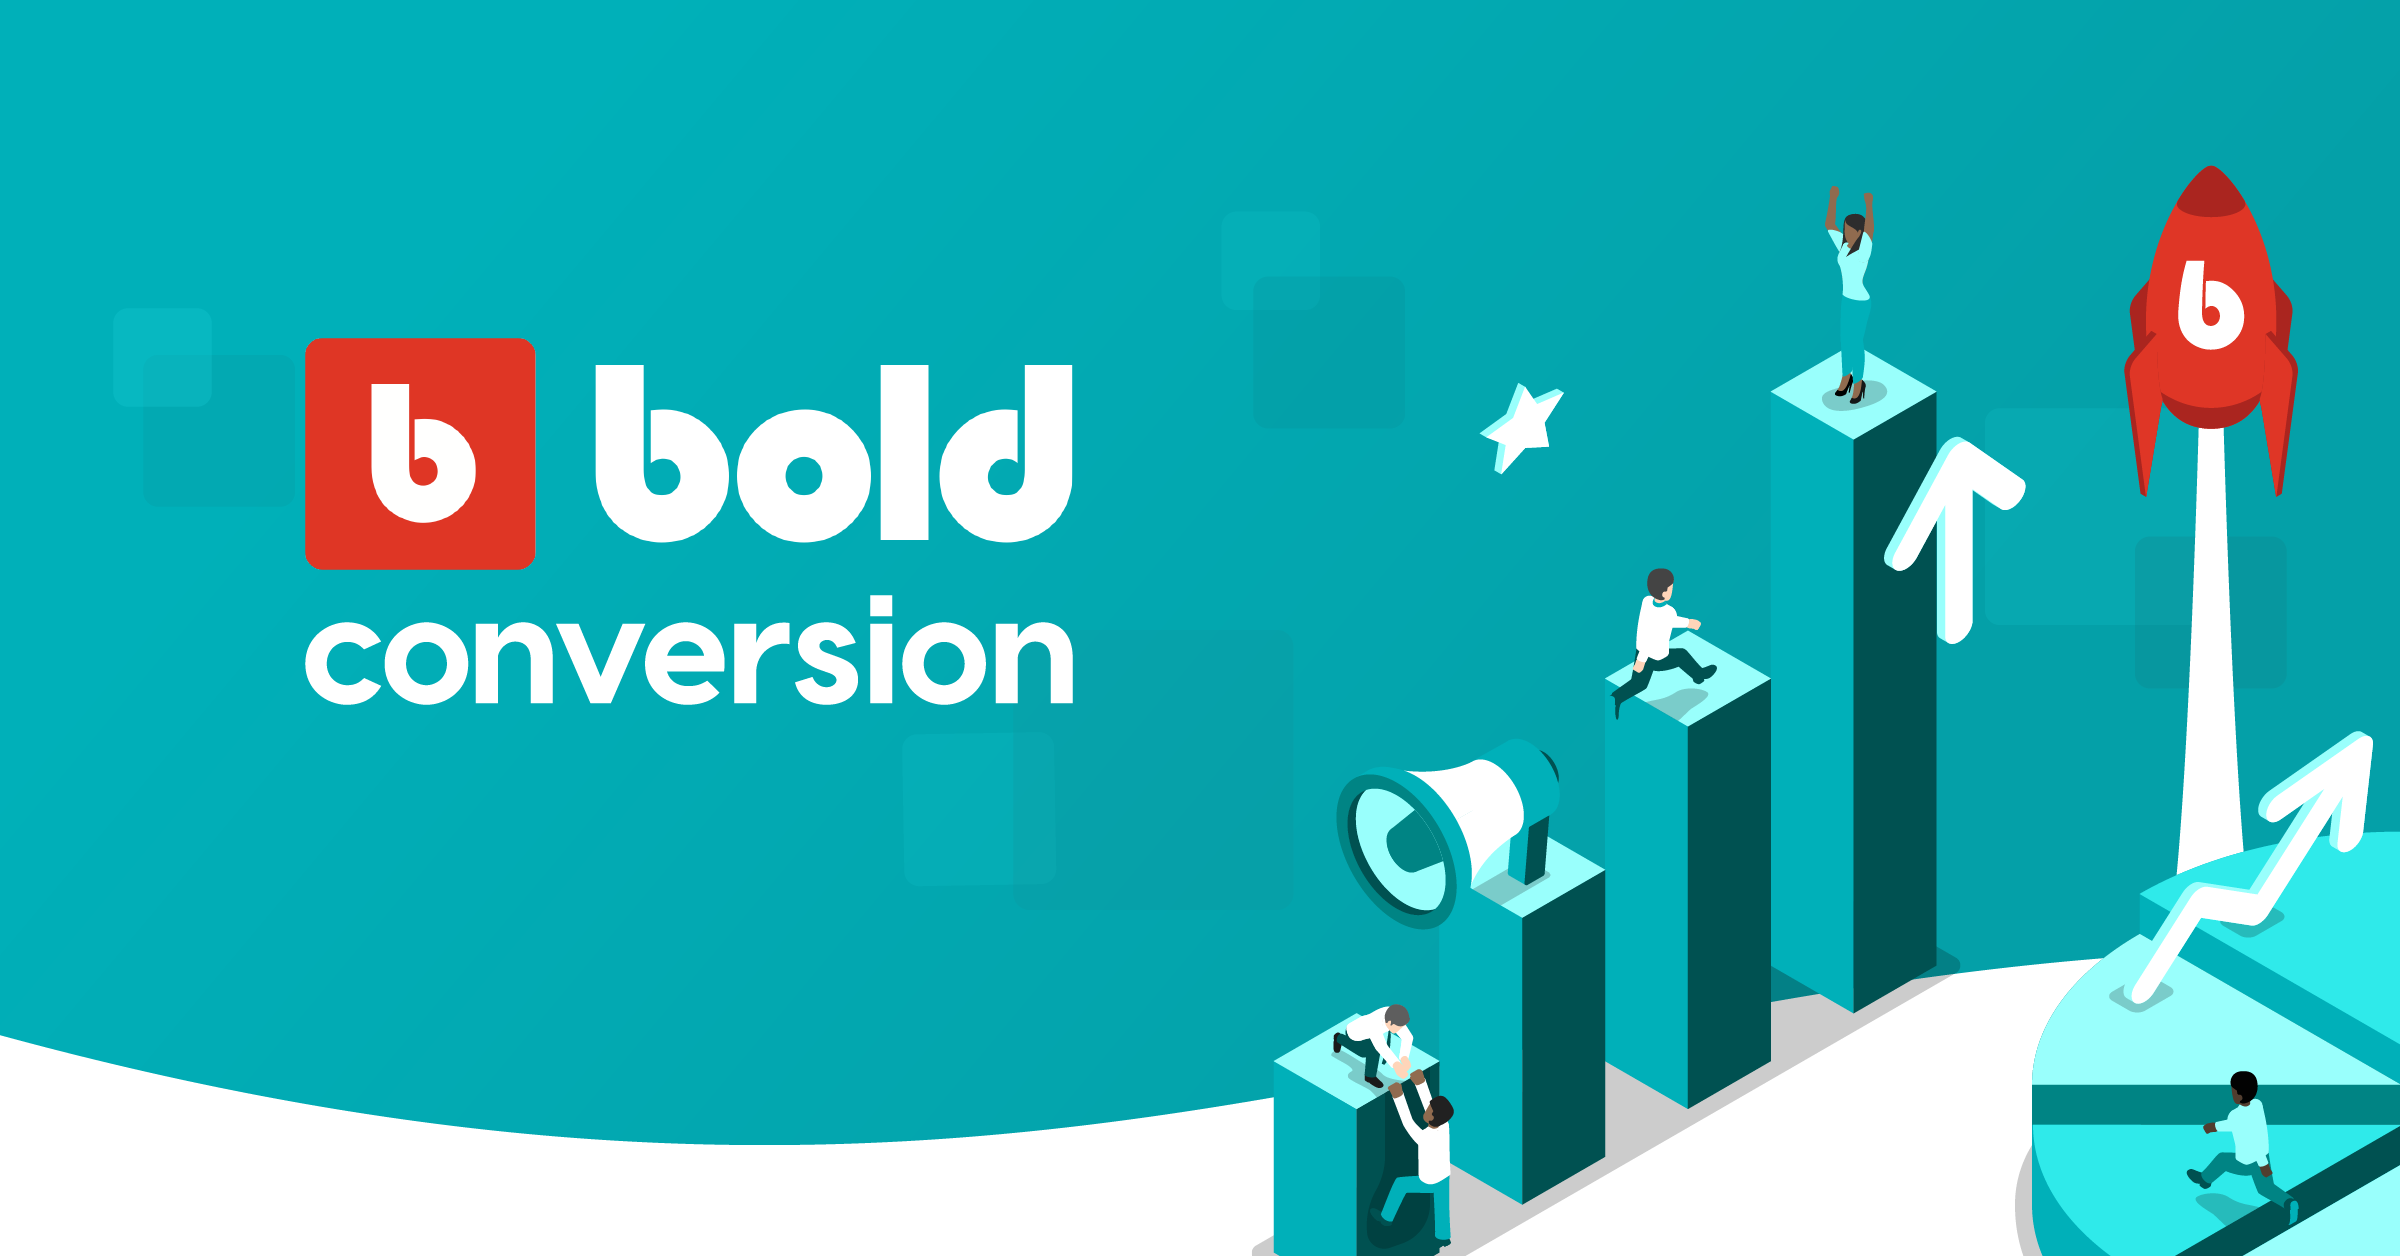 conversion-bfcm_Bold-Conversion